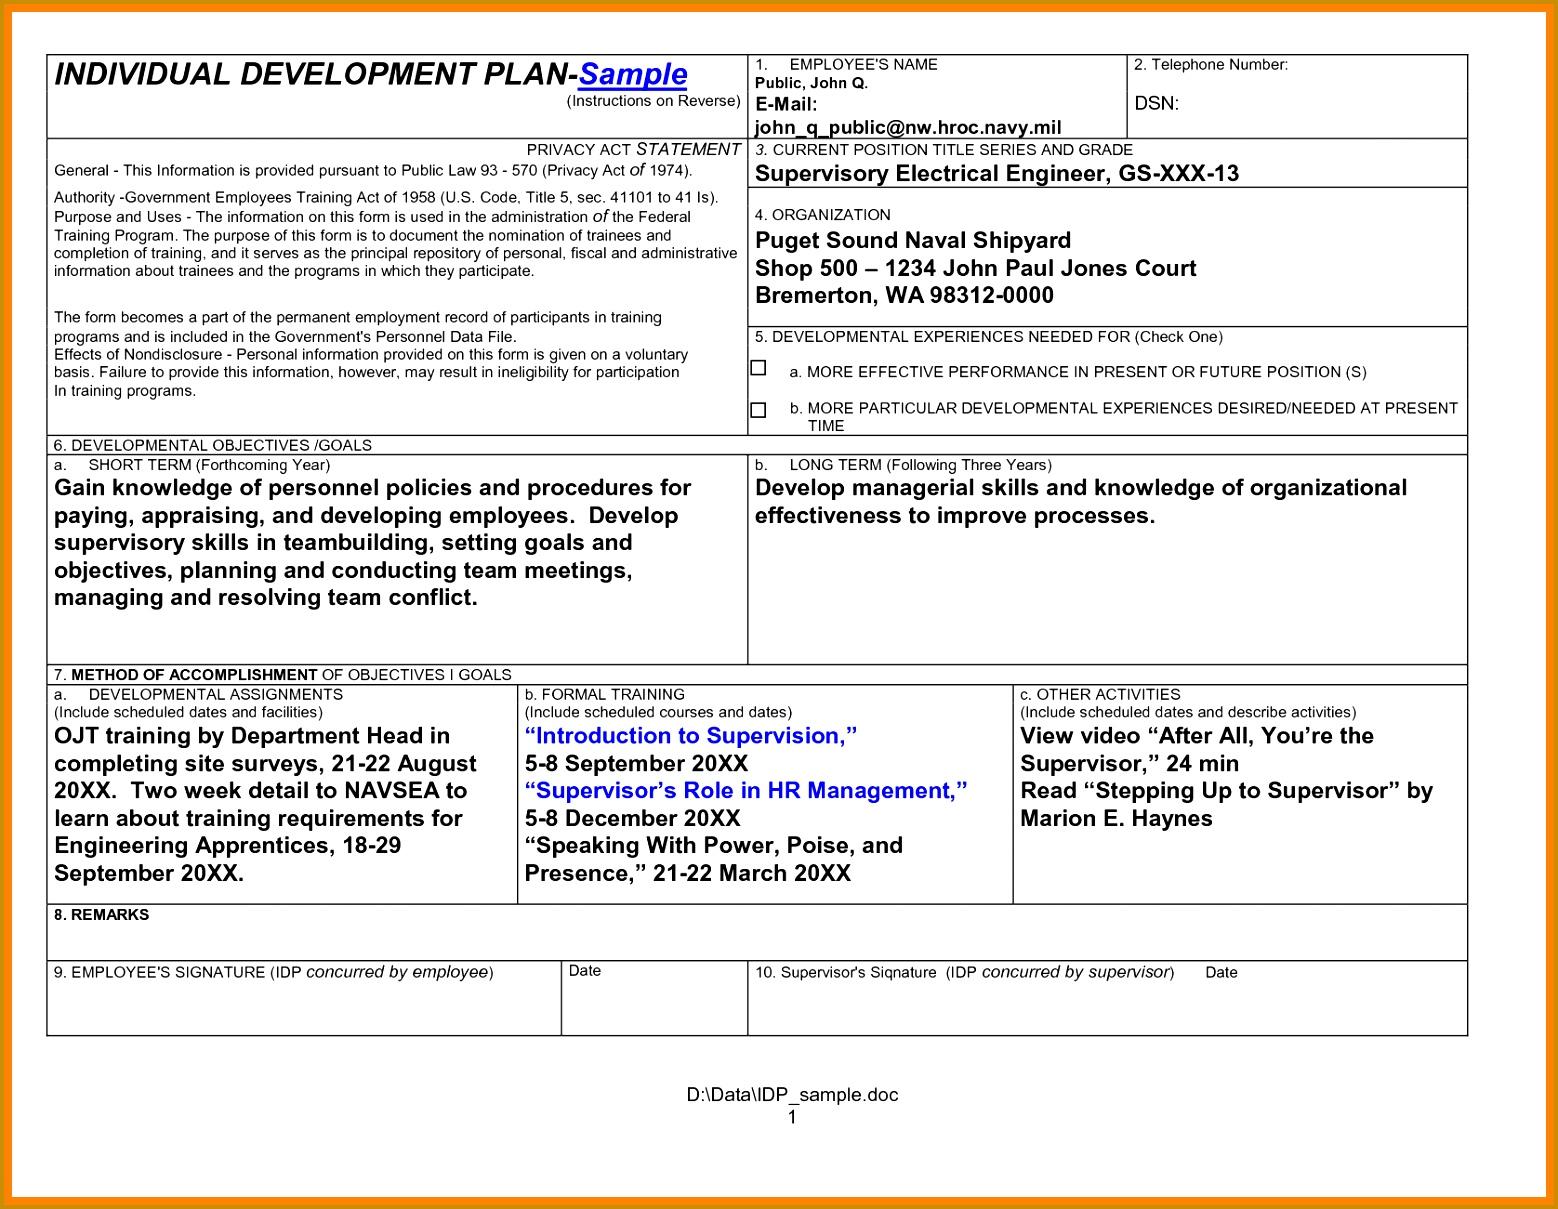 Sample Employee Work Plan Sample Work Improvement Plan Outline Calhr Home 8 Employee Development Plan Template 15581209